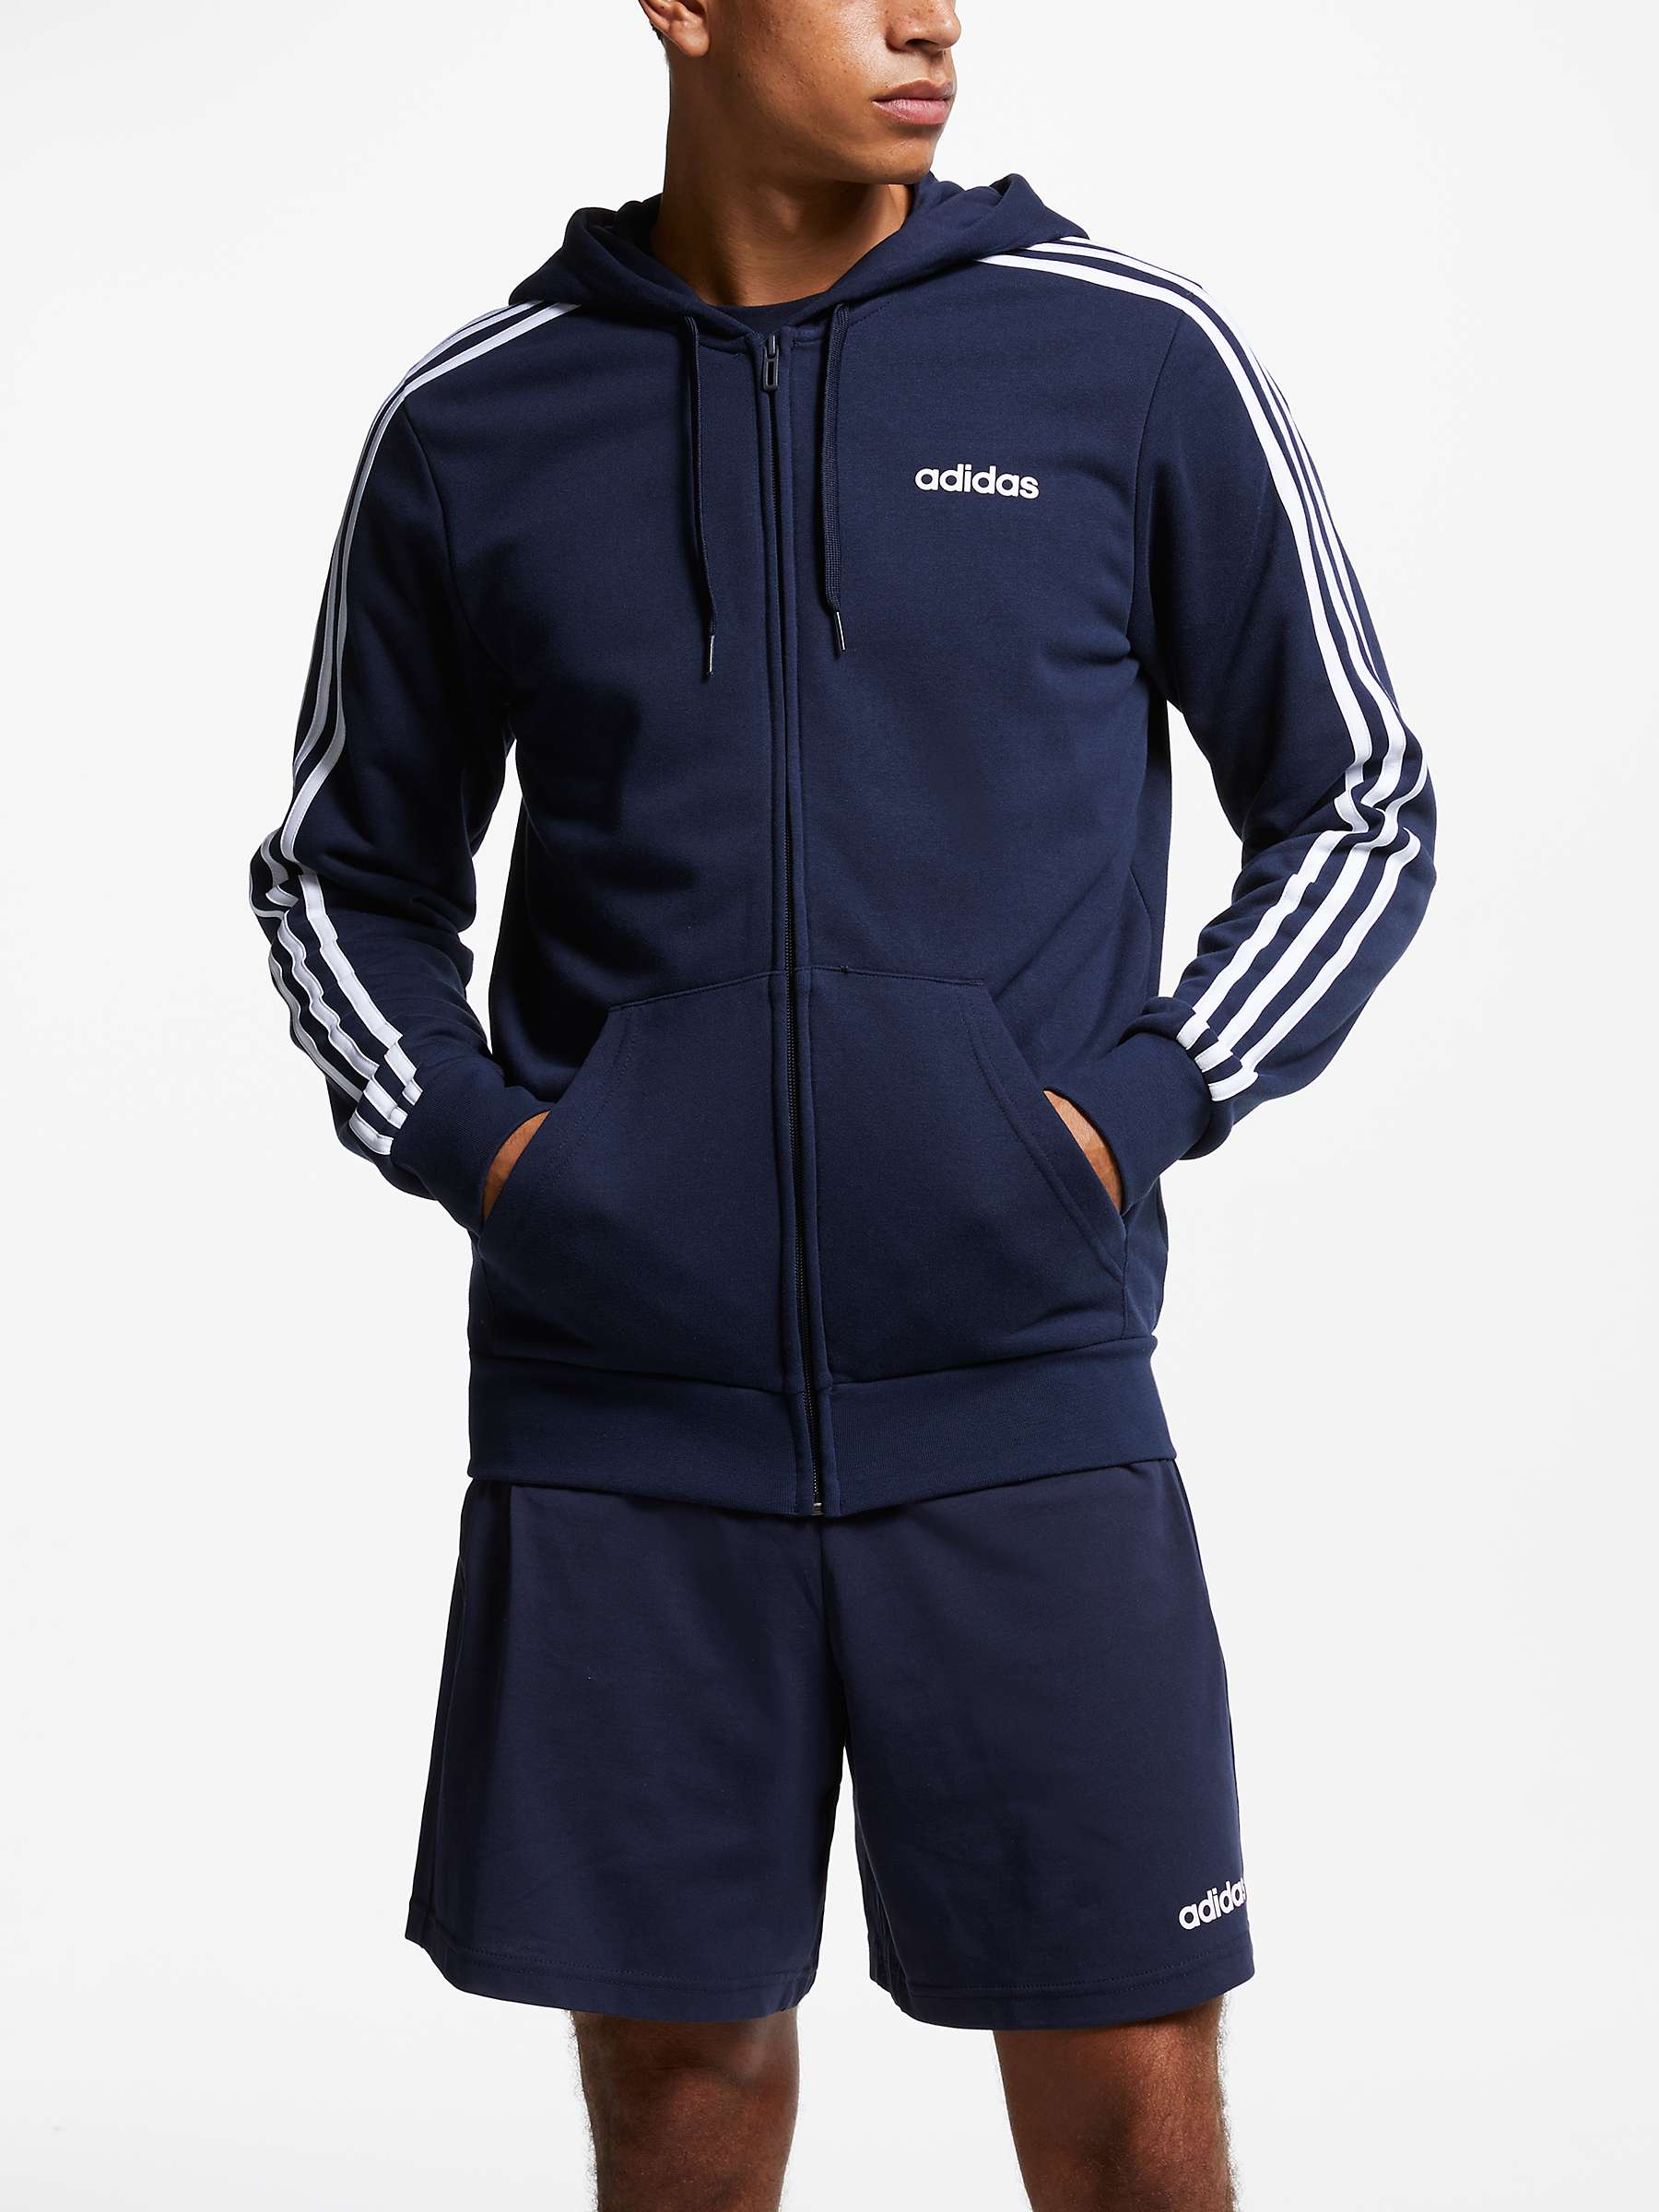 adidas Essentials 3 Stripes Hoodie, Navy